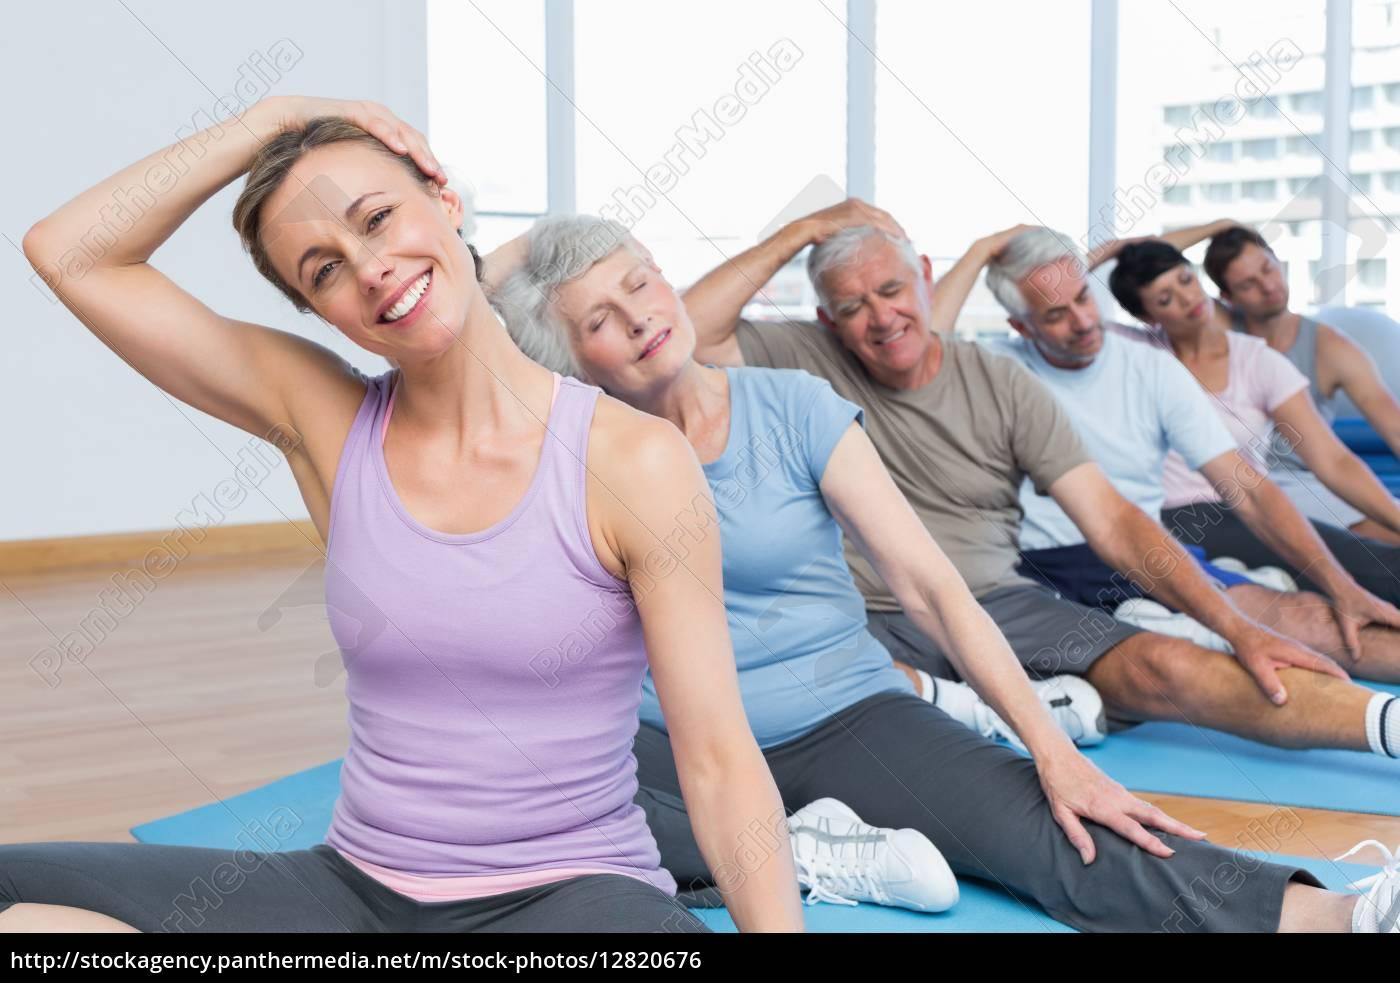 klasse, stretching, hals, in, reihe, an - 12820676